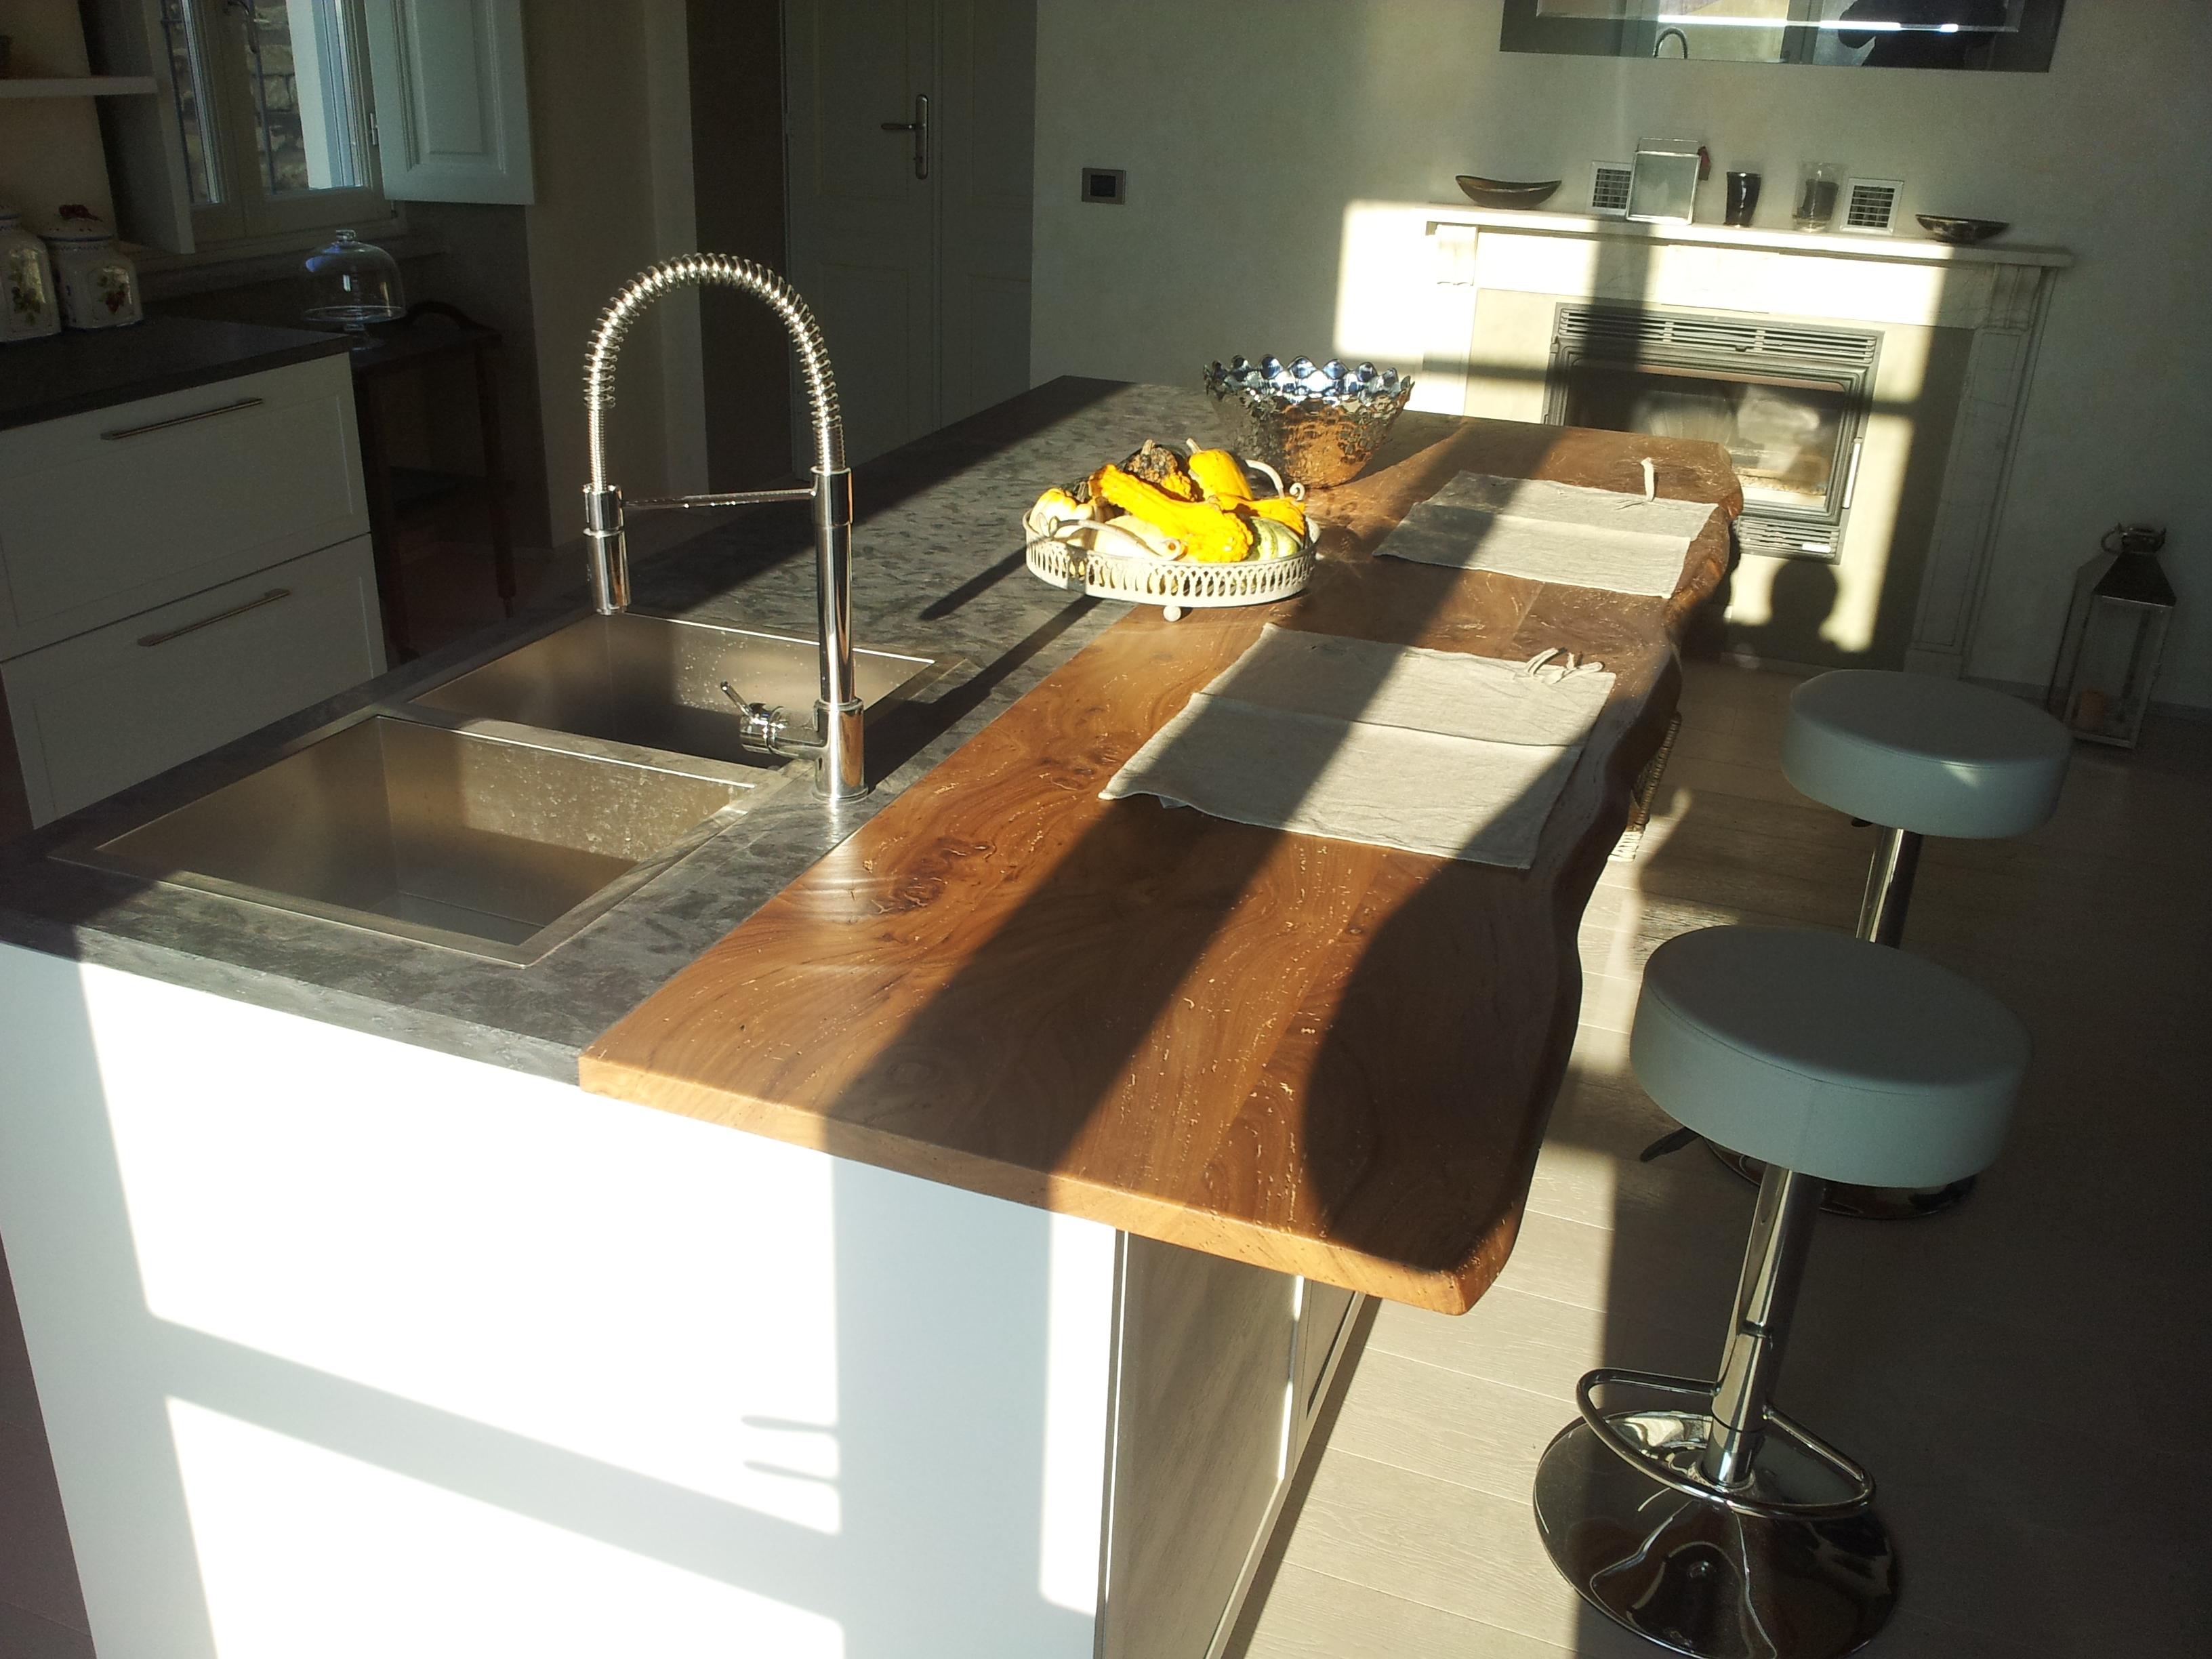 Carrello Estraibile Cucina Ikea | madgeweb.com idee di interior design